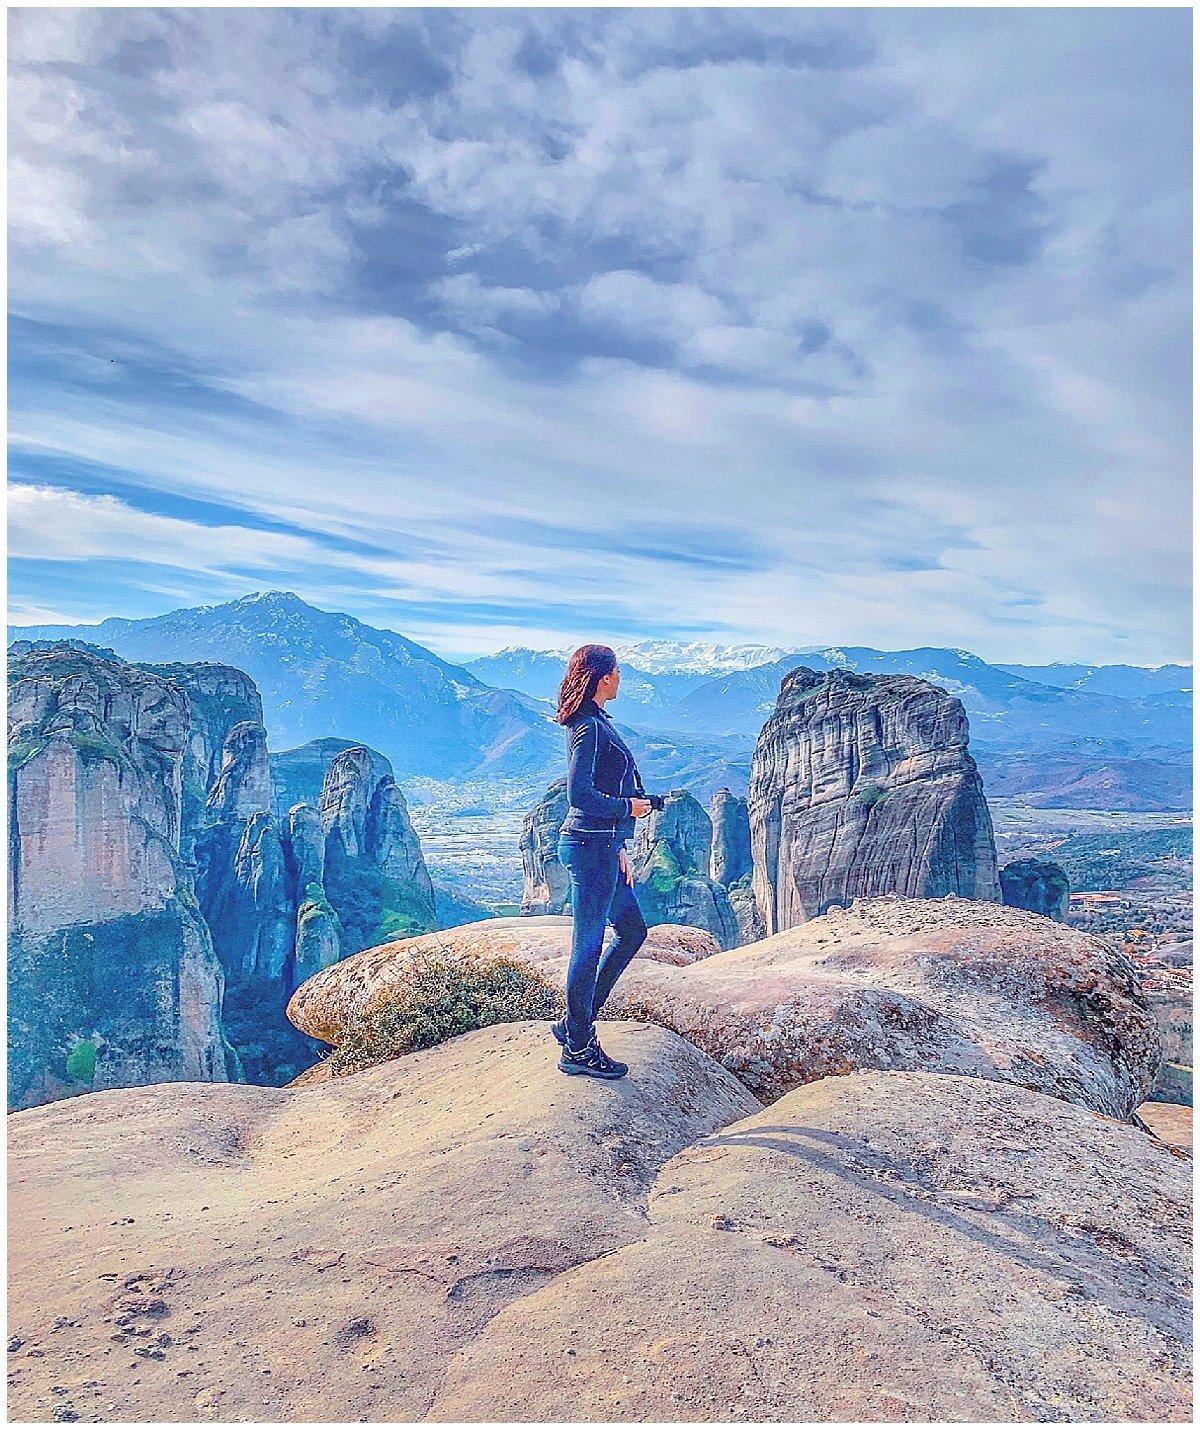 Meteora Viewpoints